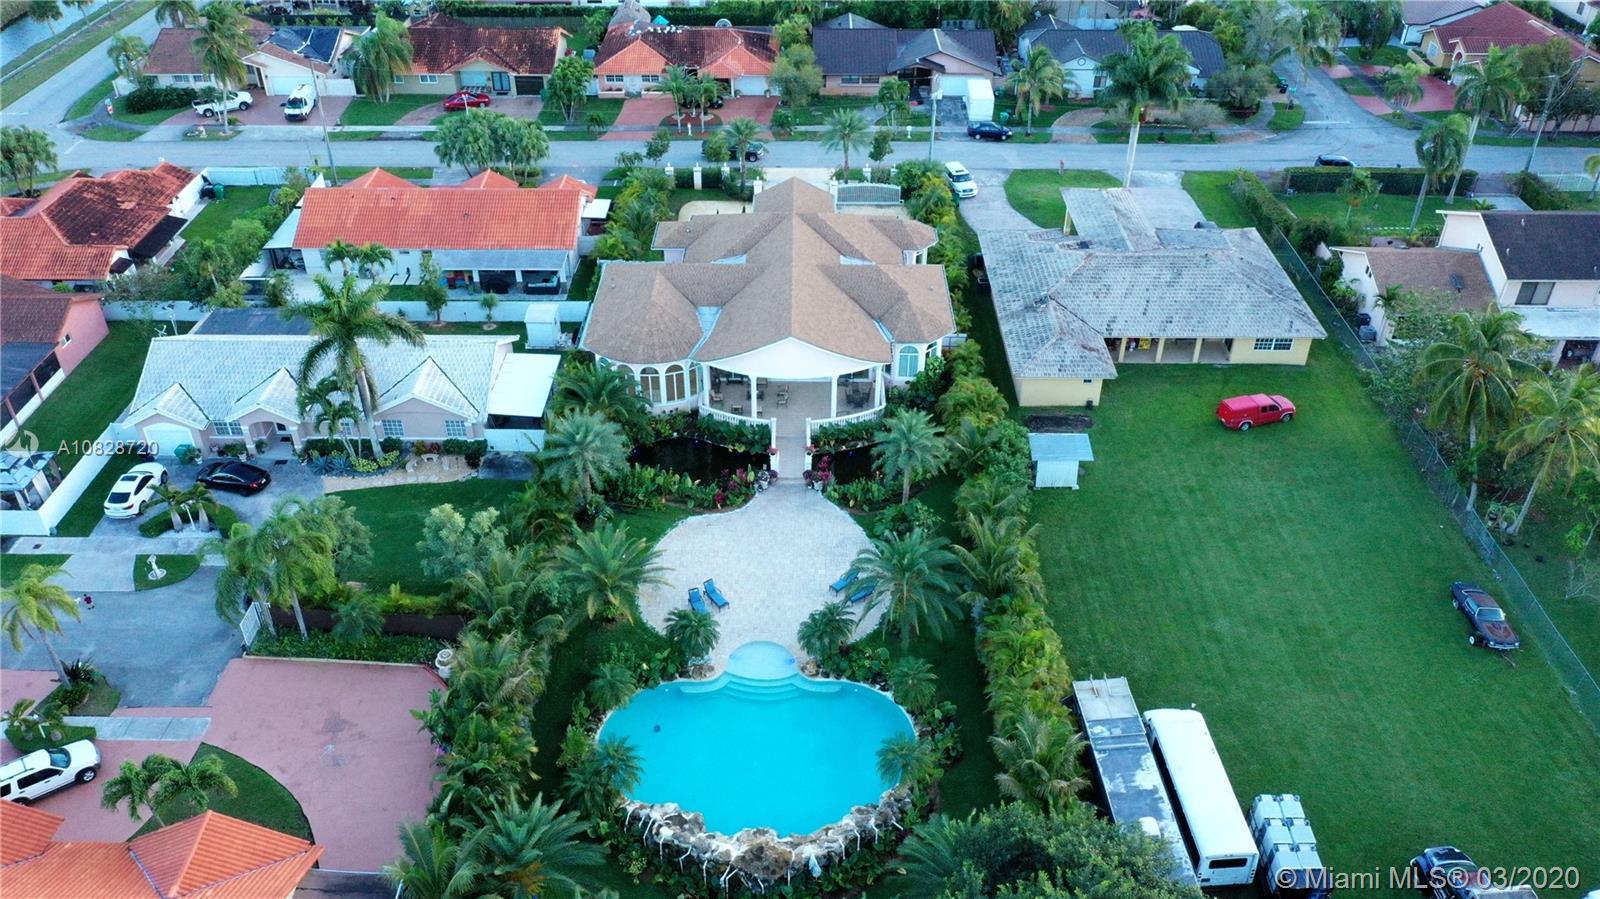 J G Heads Farms - 13255 SW 36th St, Miami, FL 33175